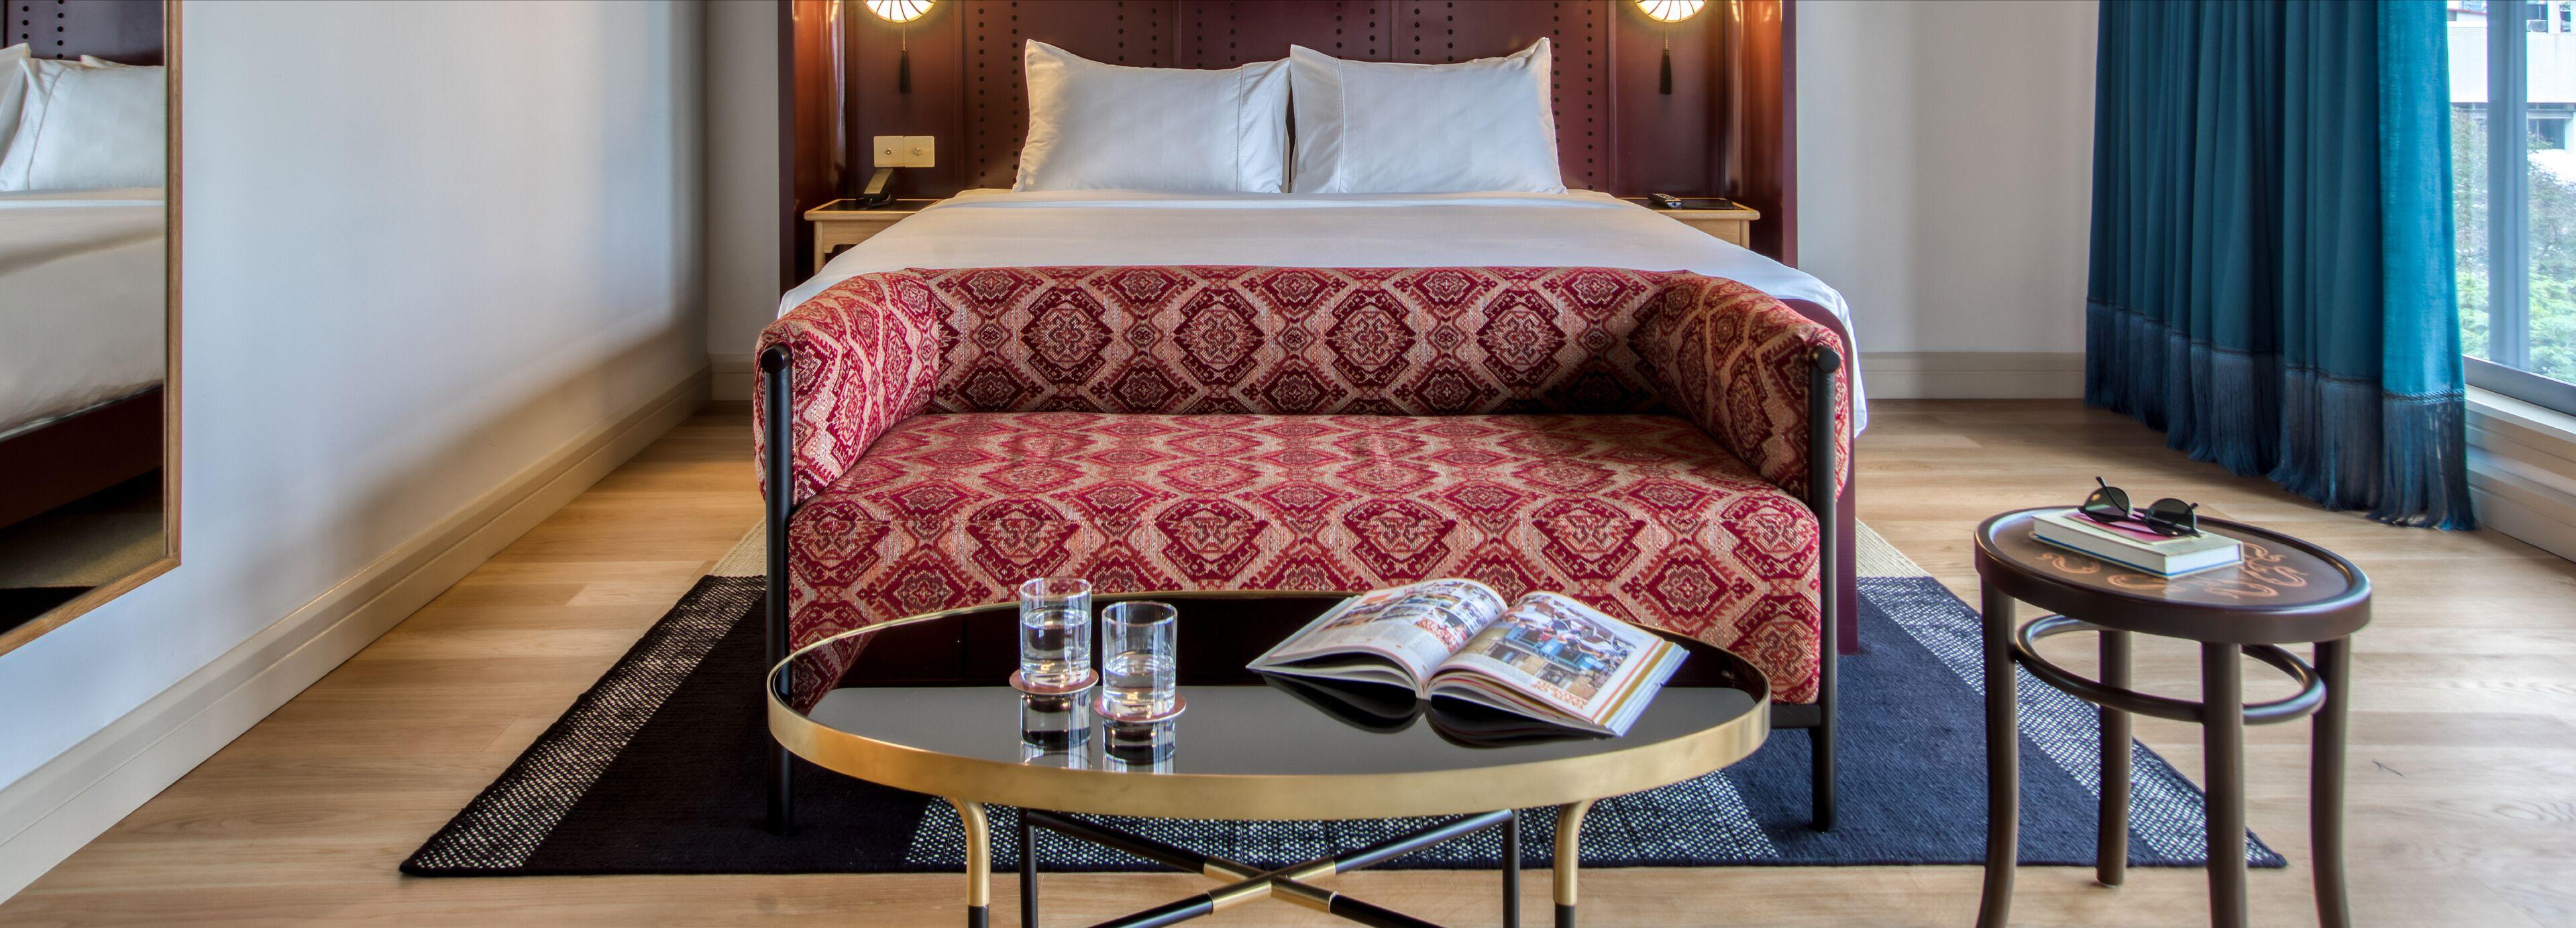 The Chow Kit - An Ormond Hotel